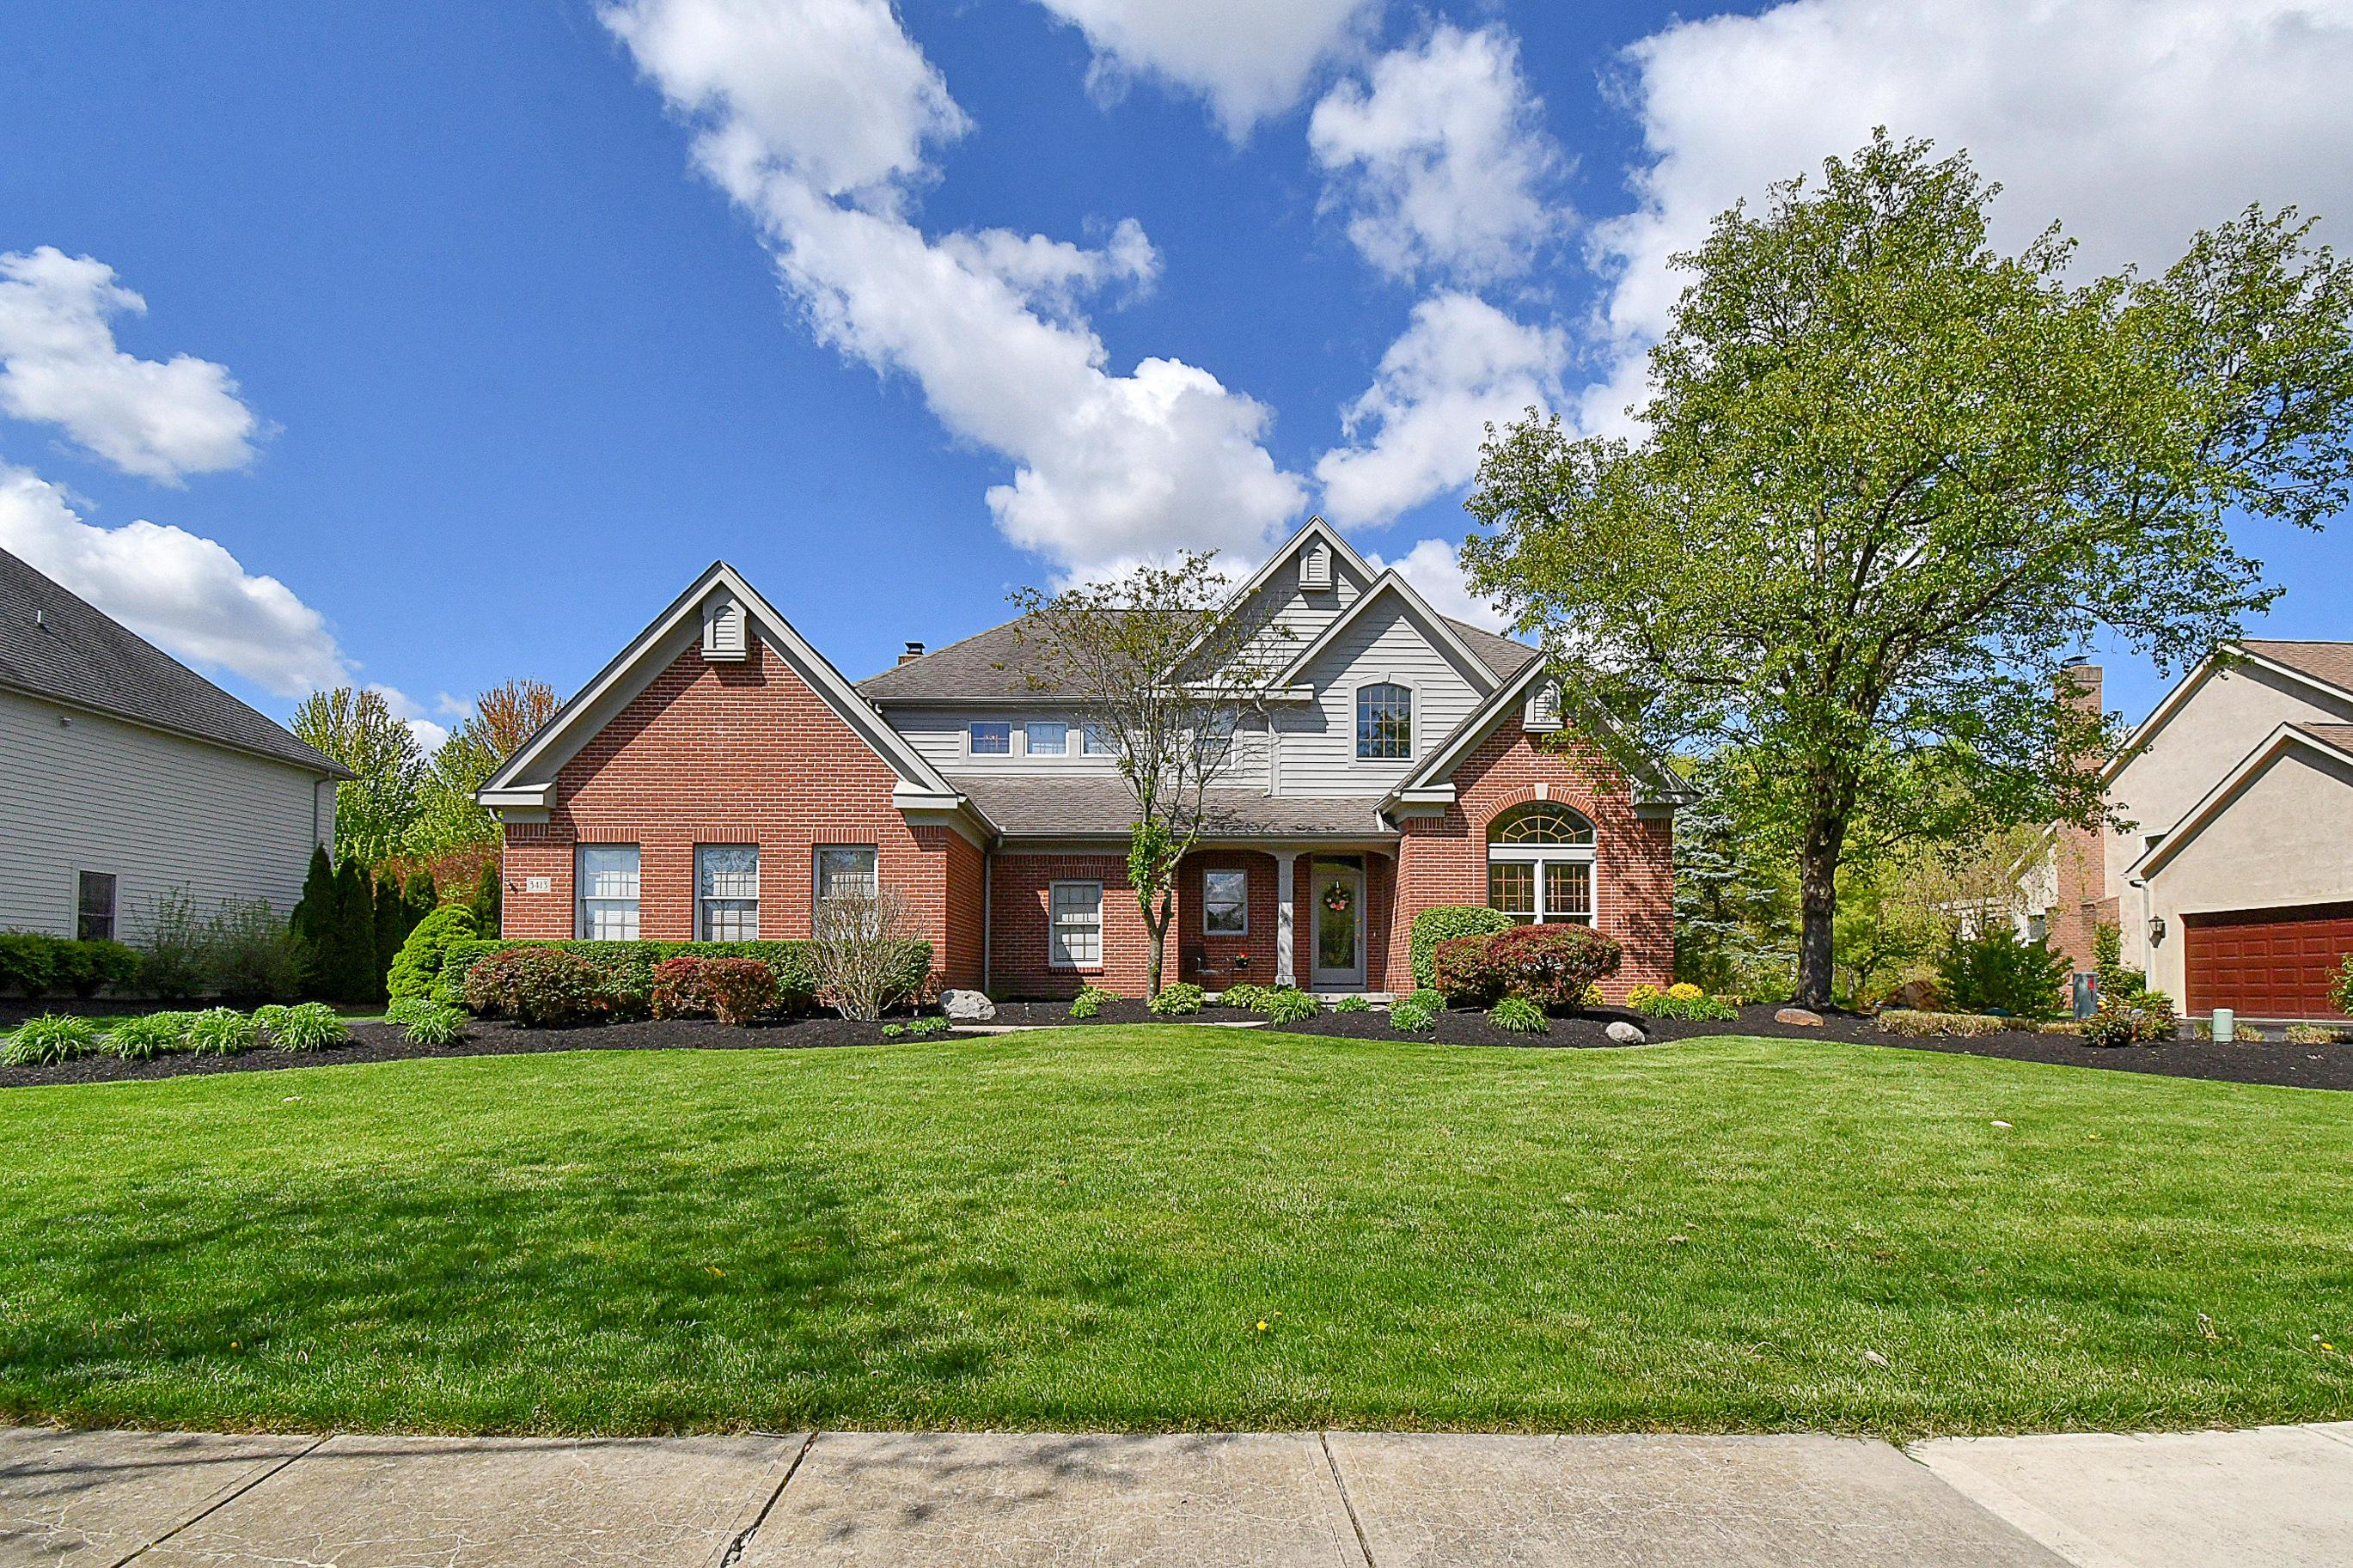 Photo of 3413 Heritage Oaks Drive, Hilliard, OH 43026